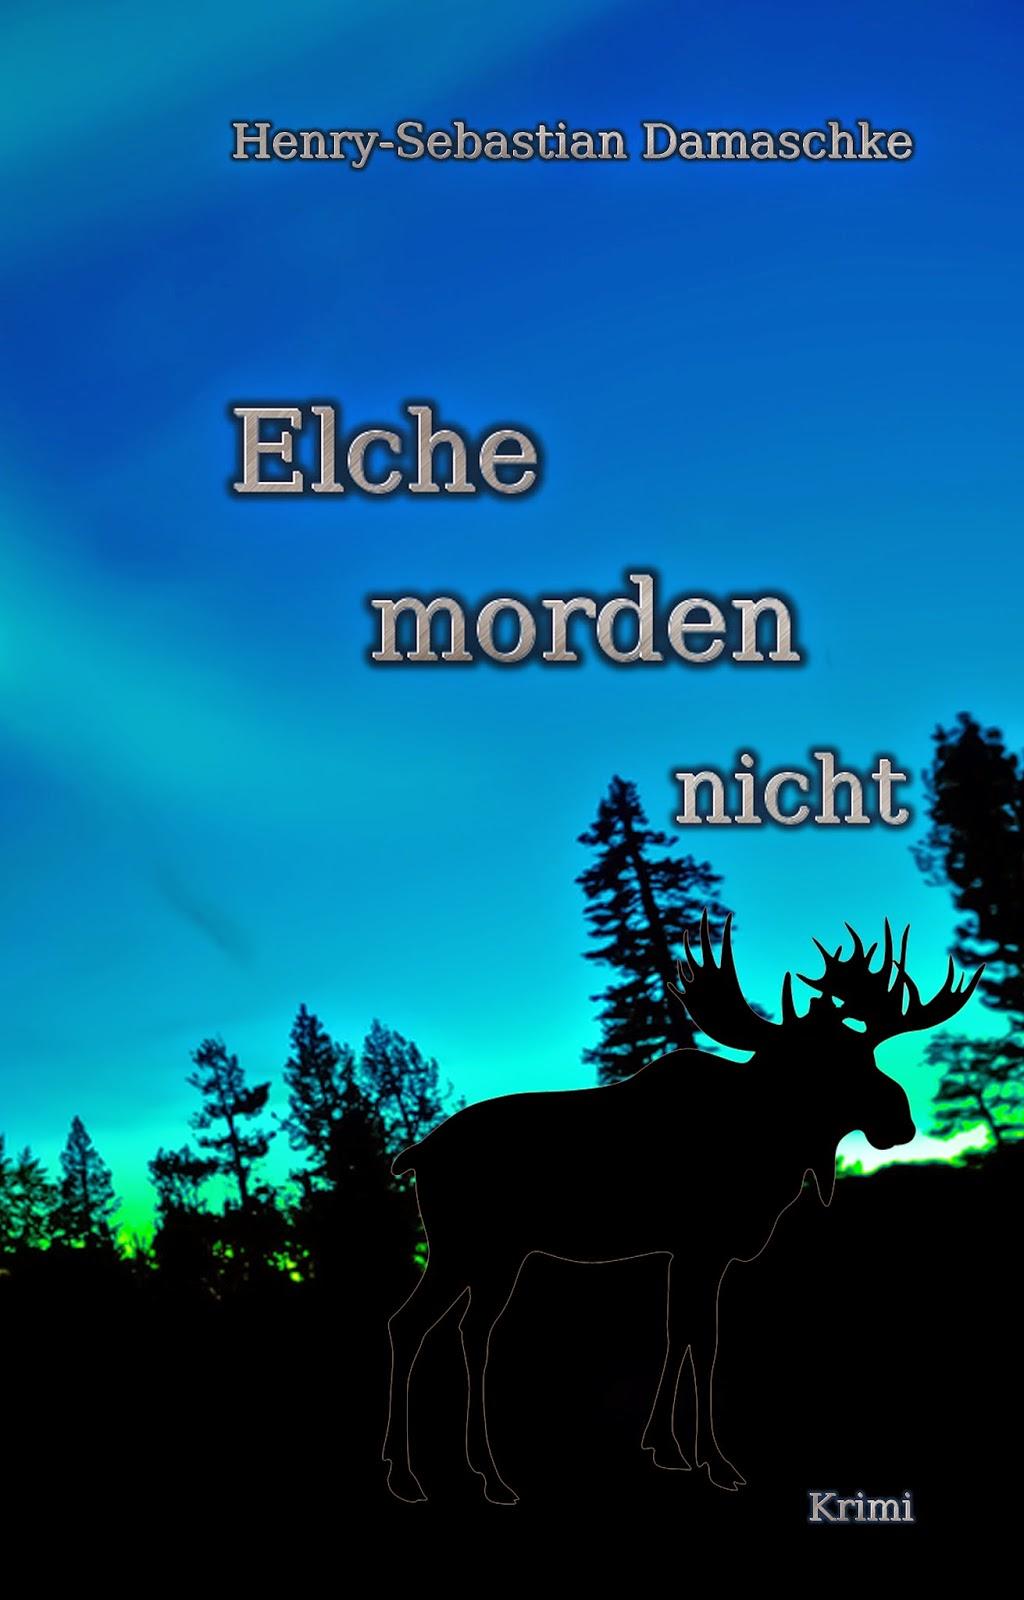 http://www.amazon.de/Elche-morden-nicht-Henry-Sebastian-Damaschke/dp/150108268X/ref=la_B00BETR9WS_1_4?s=books&ie=UTF8&qid=1410036111&sr=1-4